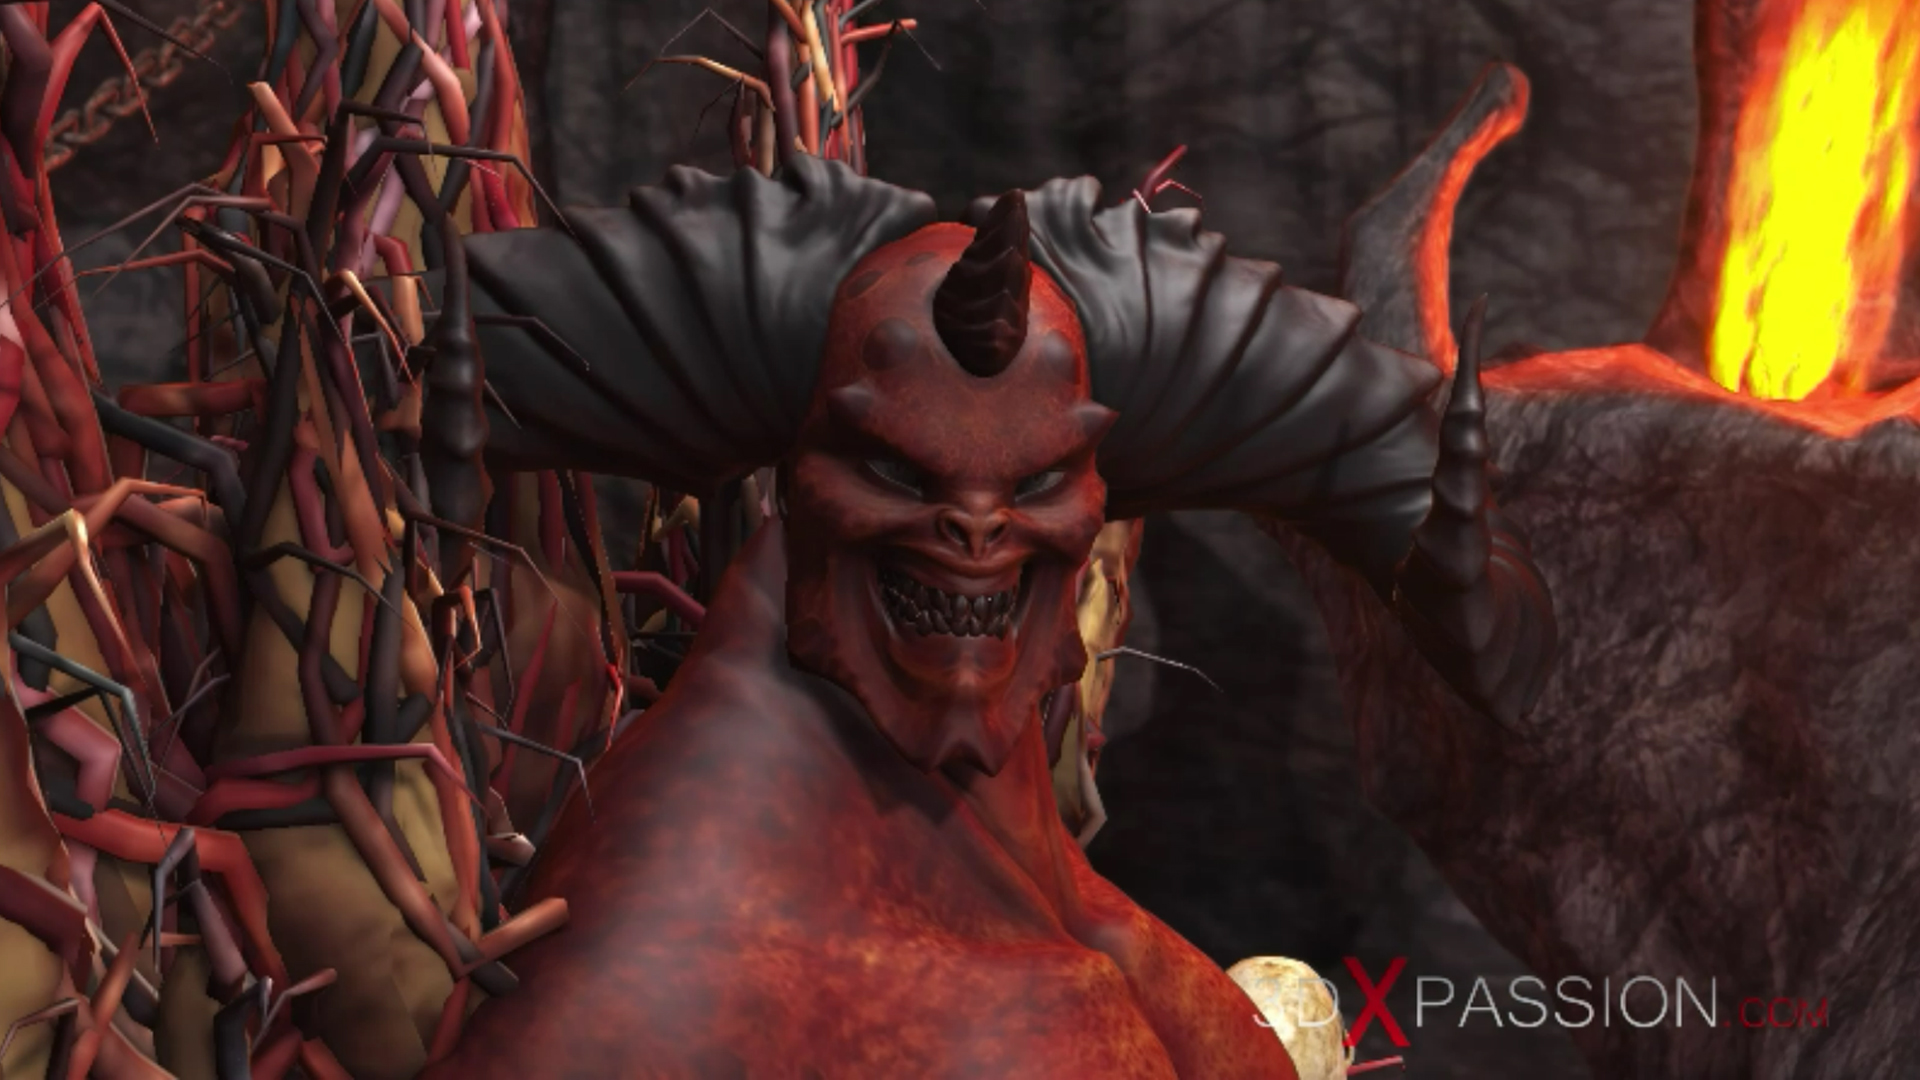 3dxpassion animation devil inferno